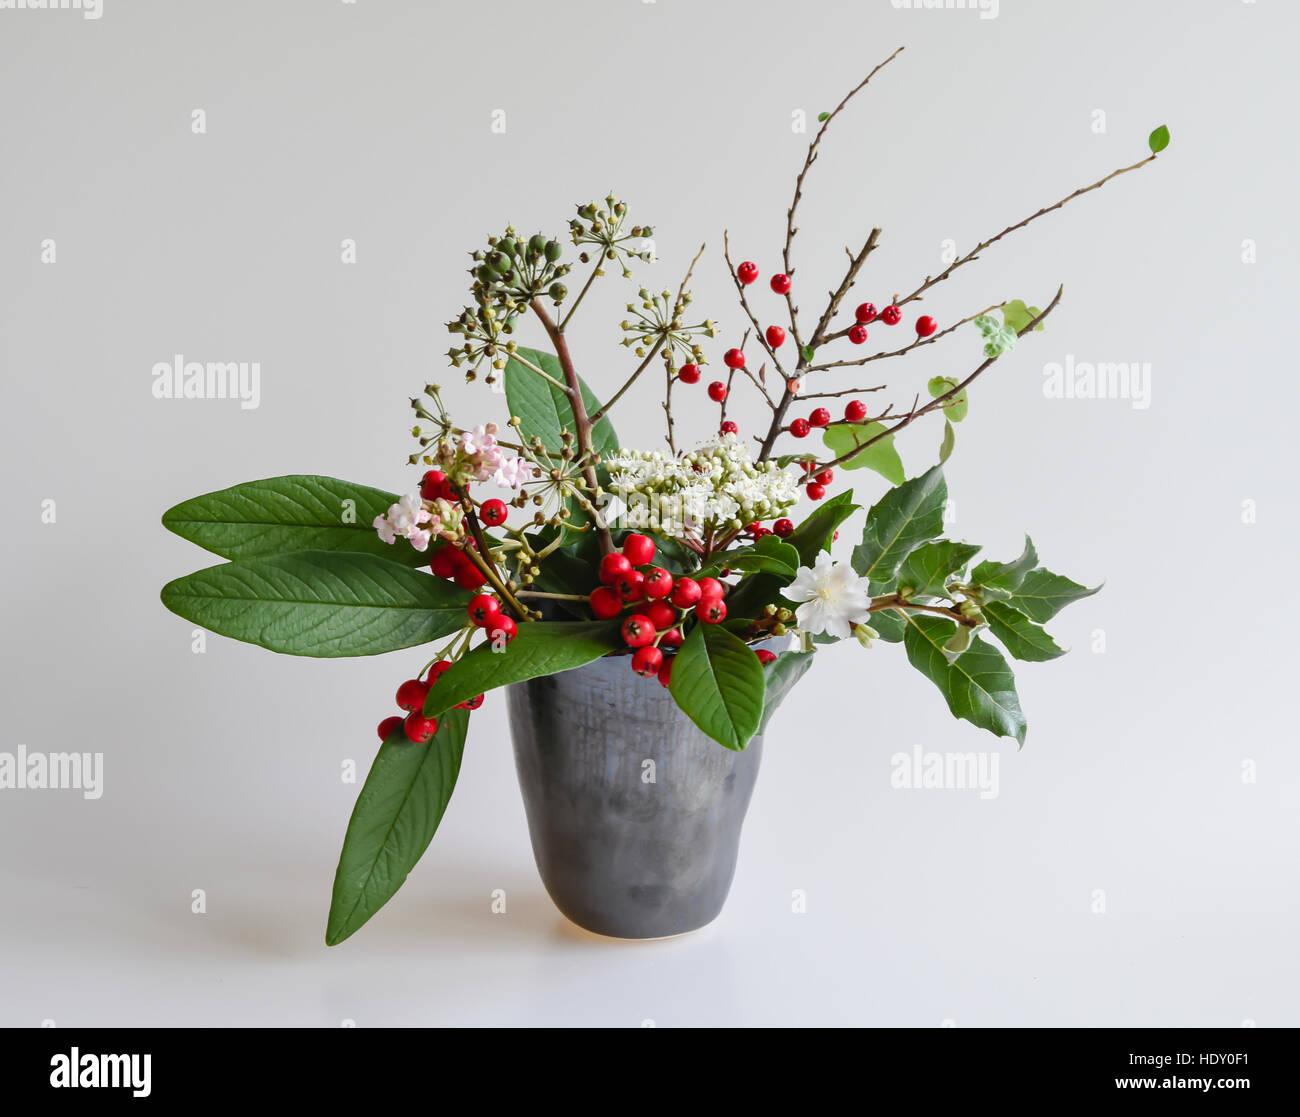 winter beeren laub blumen in einer vase keramik studio zwergmispel garrya blumen efeu. Black Bedroom Furniture Sets. Home Design Ideas